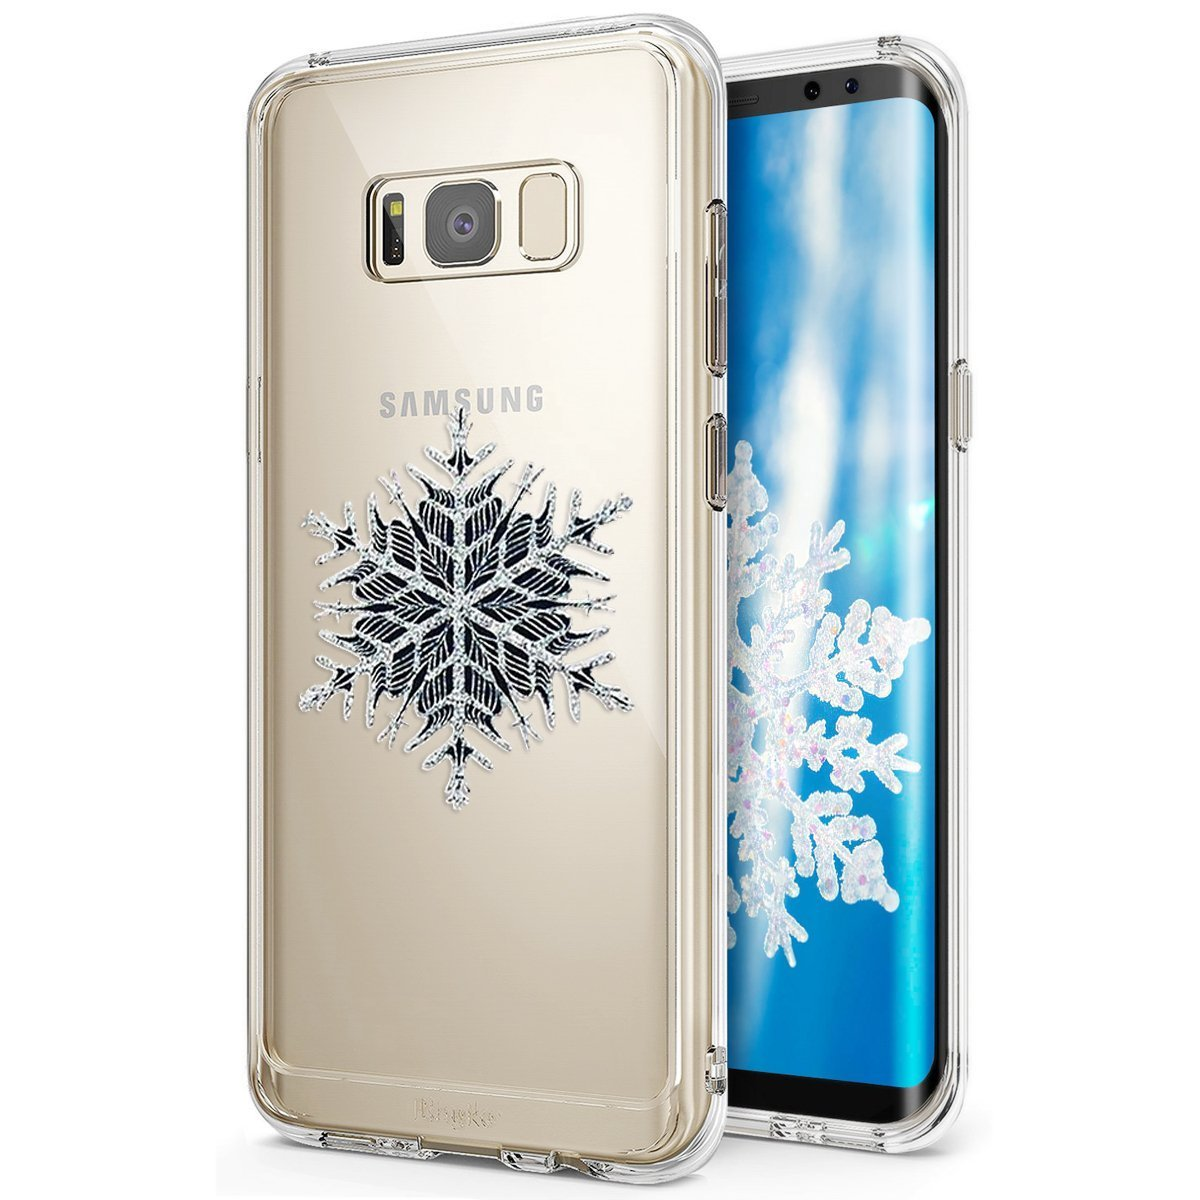 Hü lle fü r Samsung Galaxy S8,Samsung Galaxy S8 Silikonhü lle, Herbests Samsung Galaxy S8 Transparent Schutzhü lle Silikon Handyhü lle Ultra Slim Crystal Clear,Ultra Dü nn Case Schlank Etui Bumper-Style Premium Kratzfest Soft